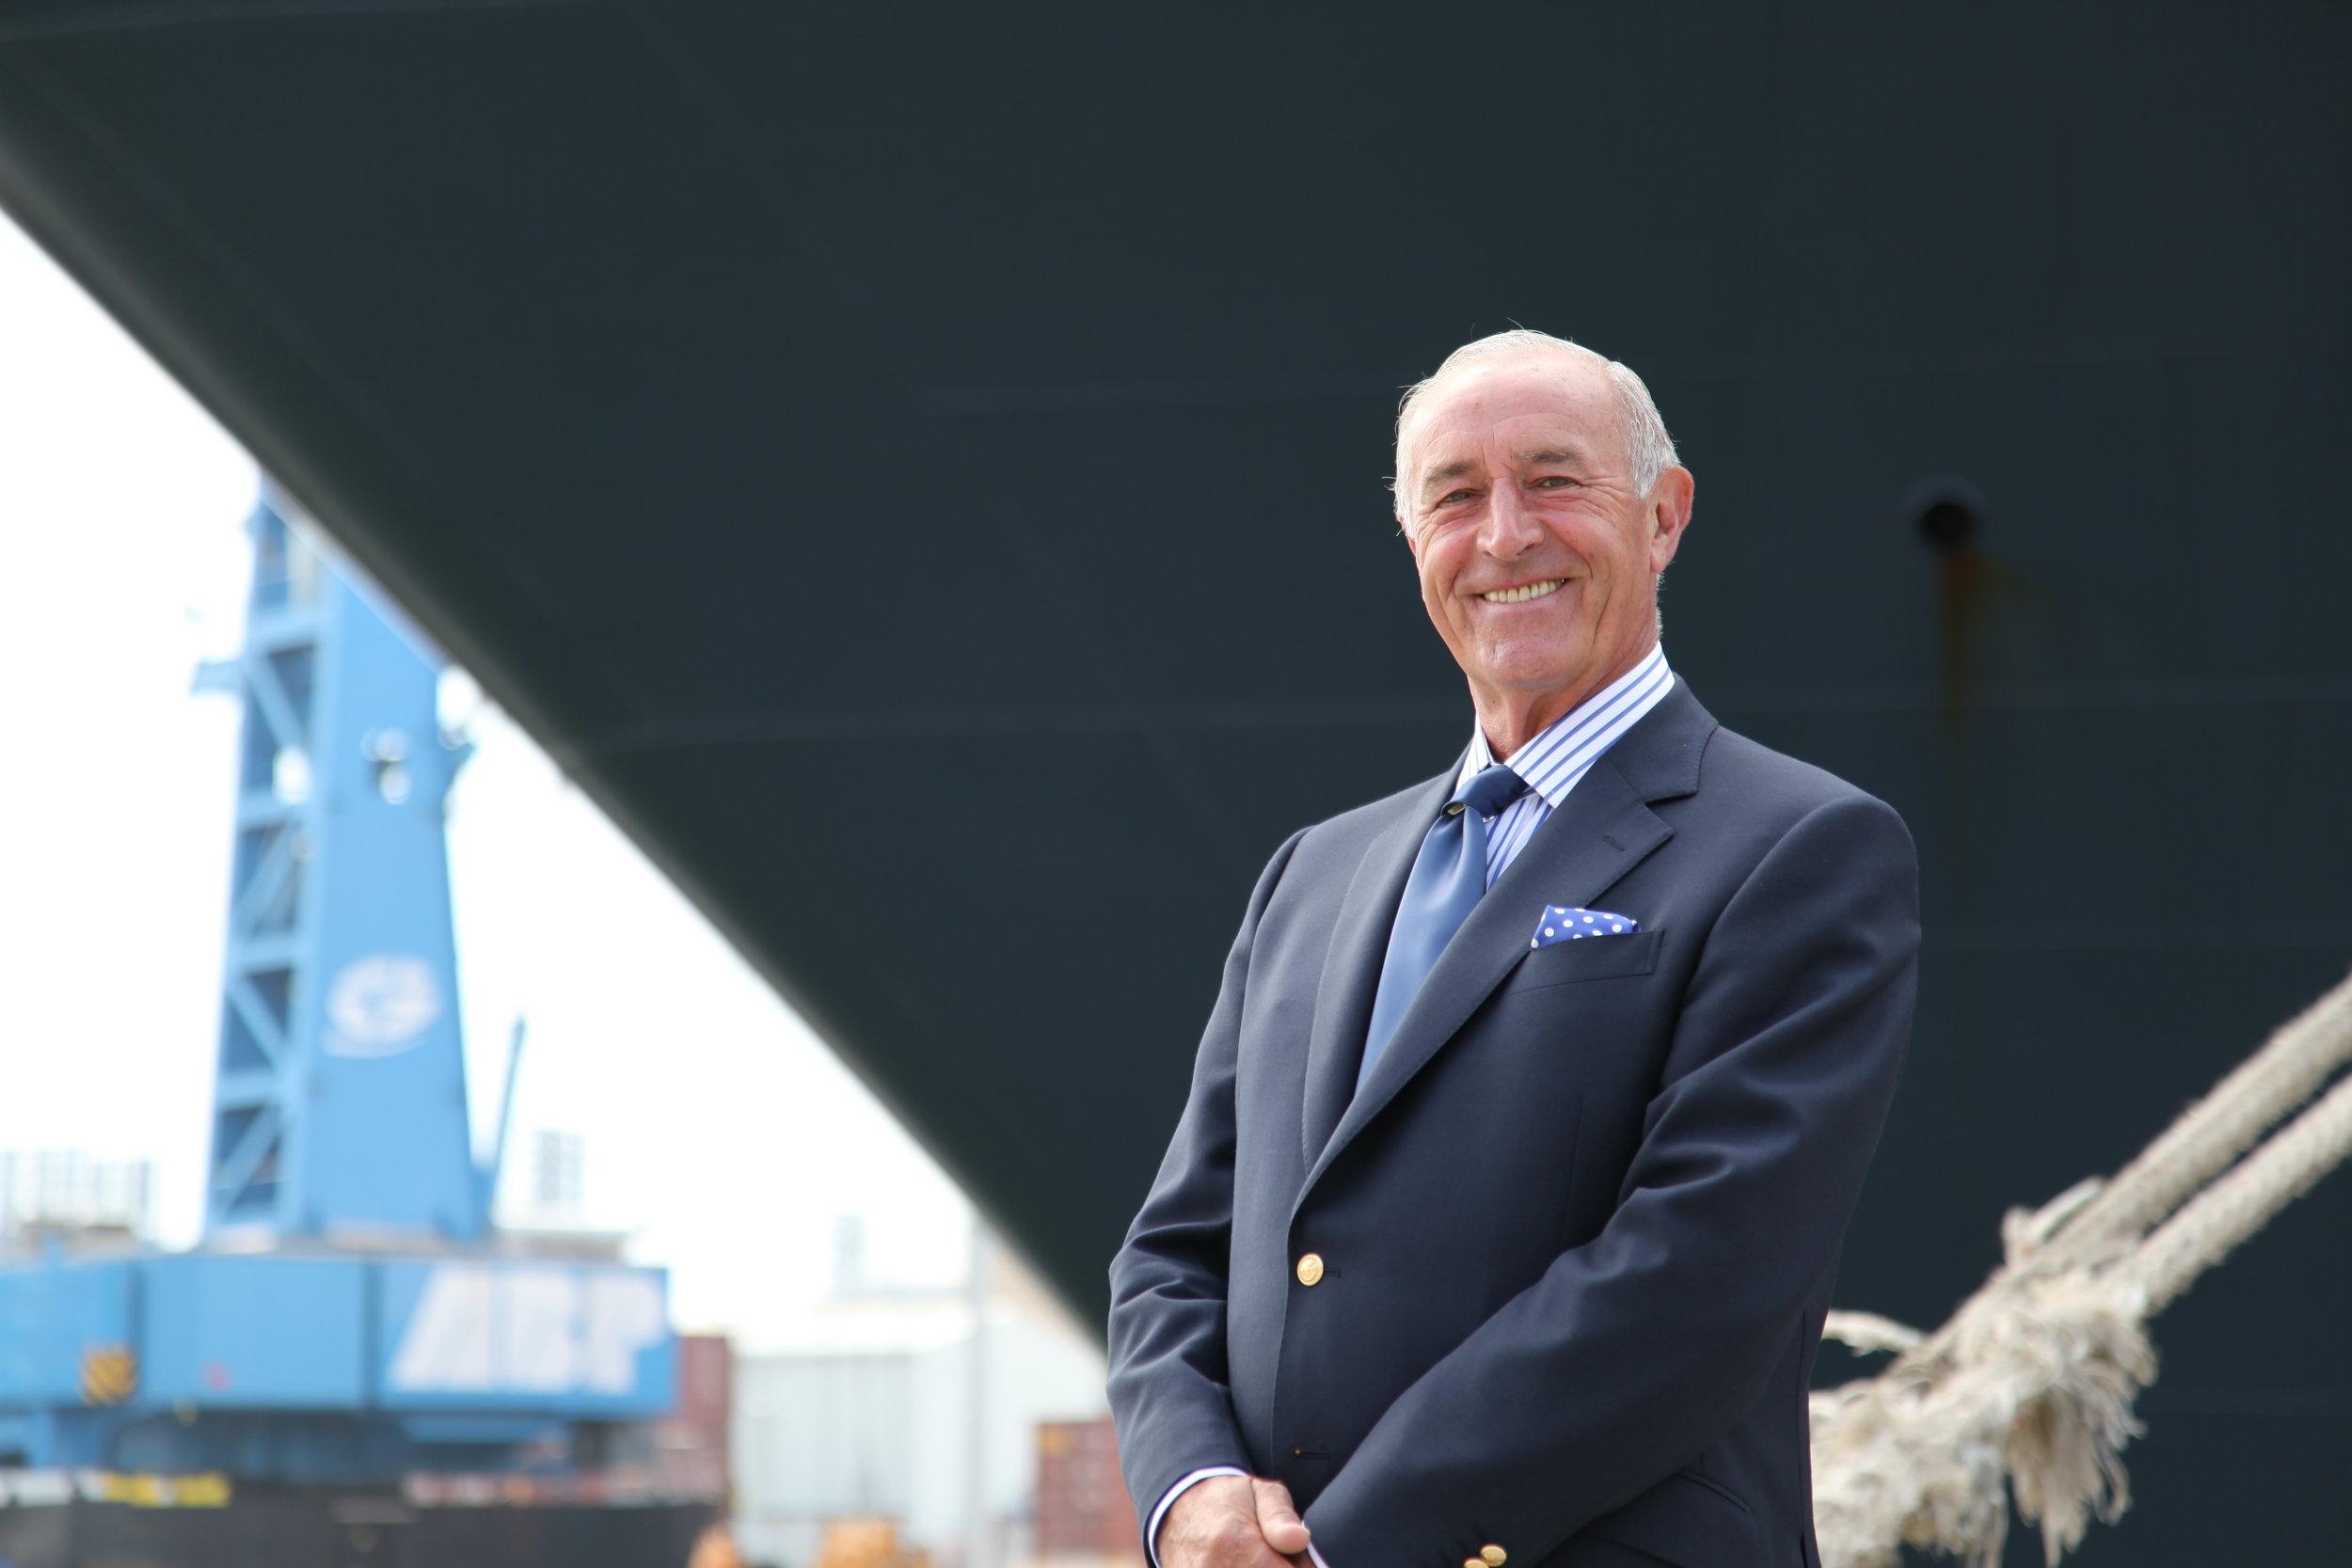 Titanic with Len Goodman - BBC One